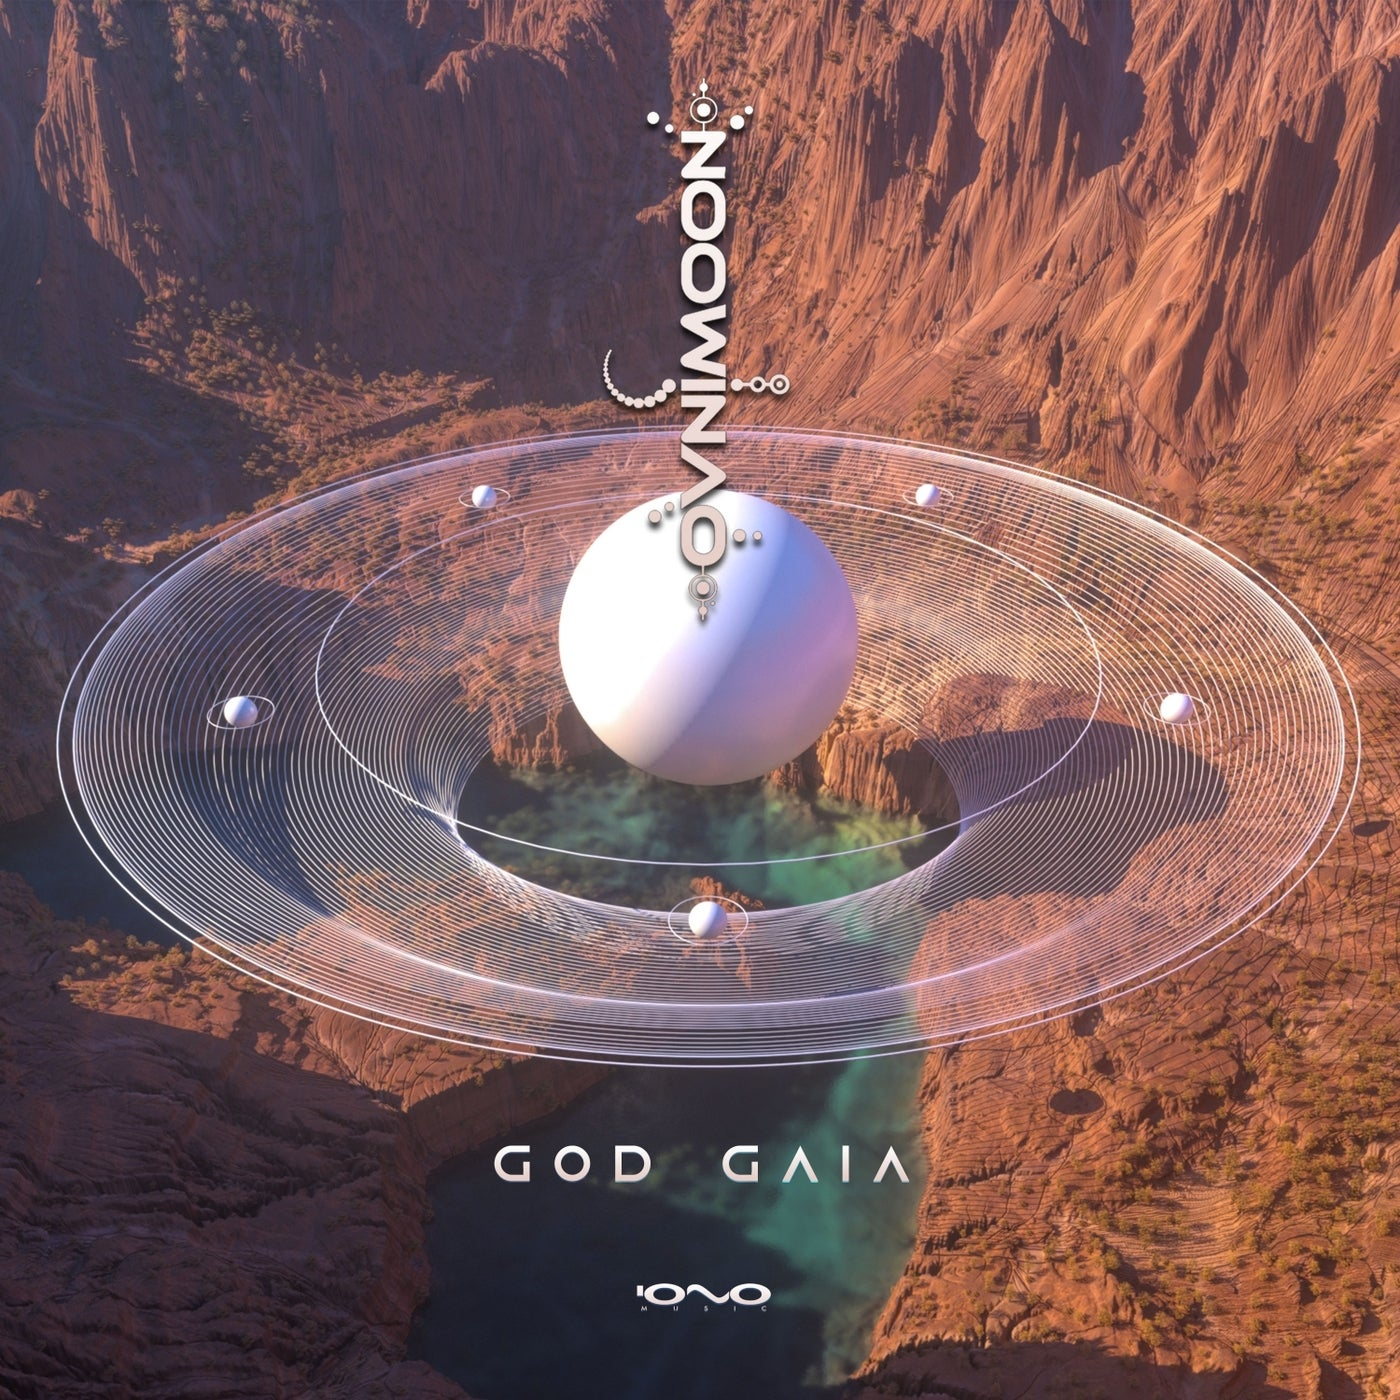 God Gaia (Original Mix)